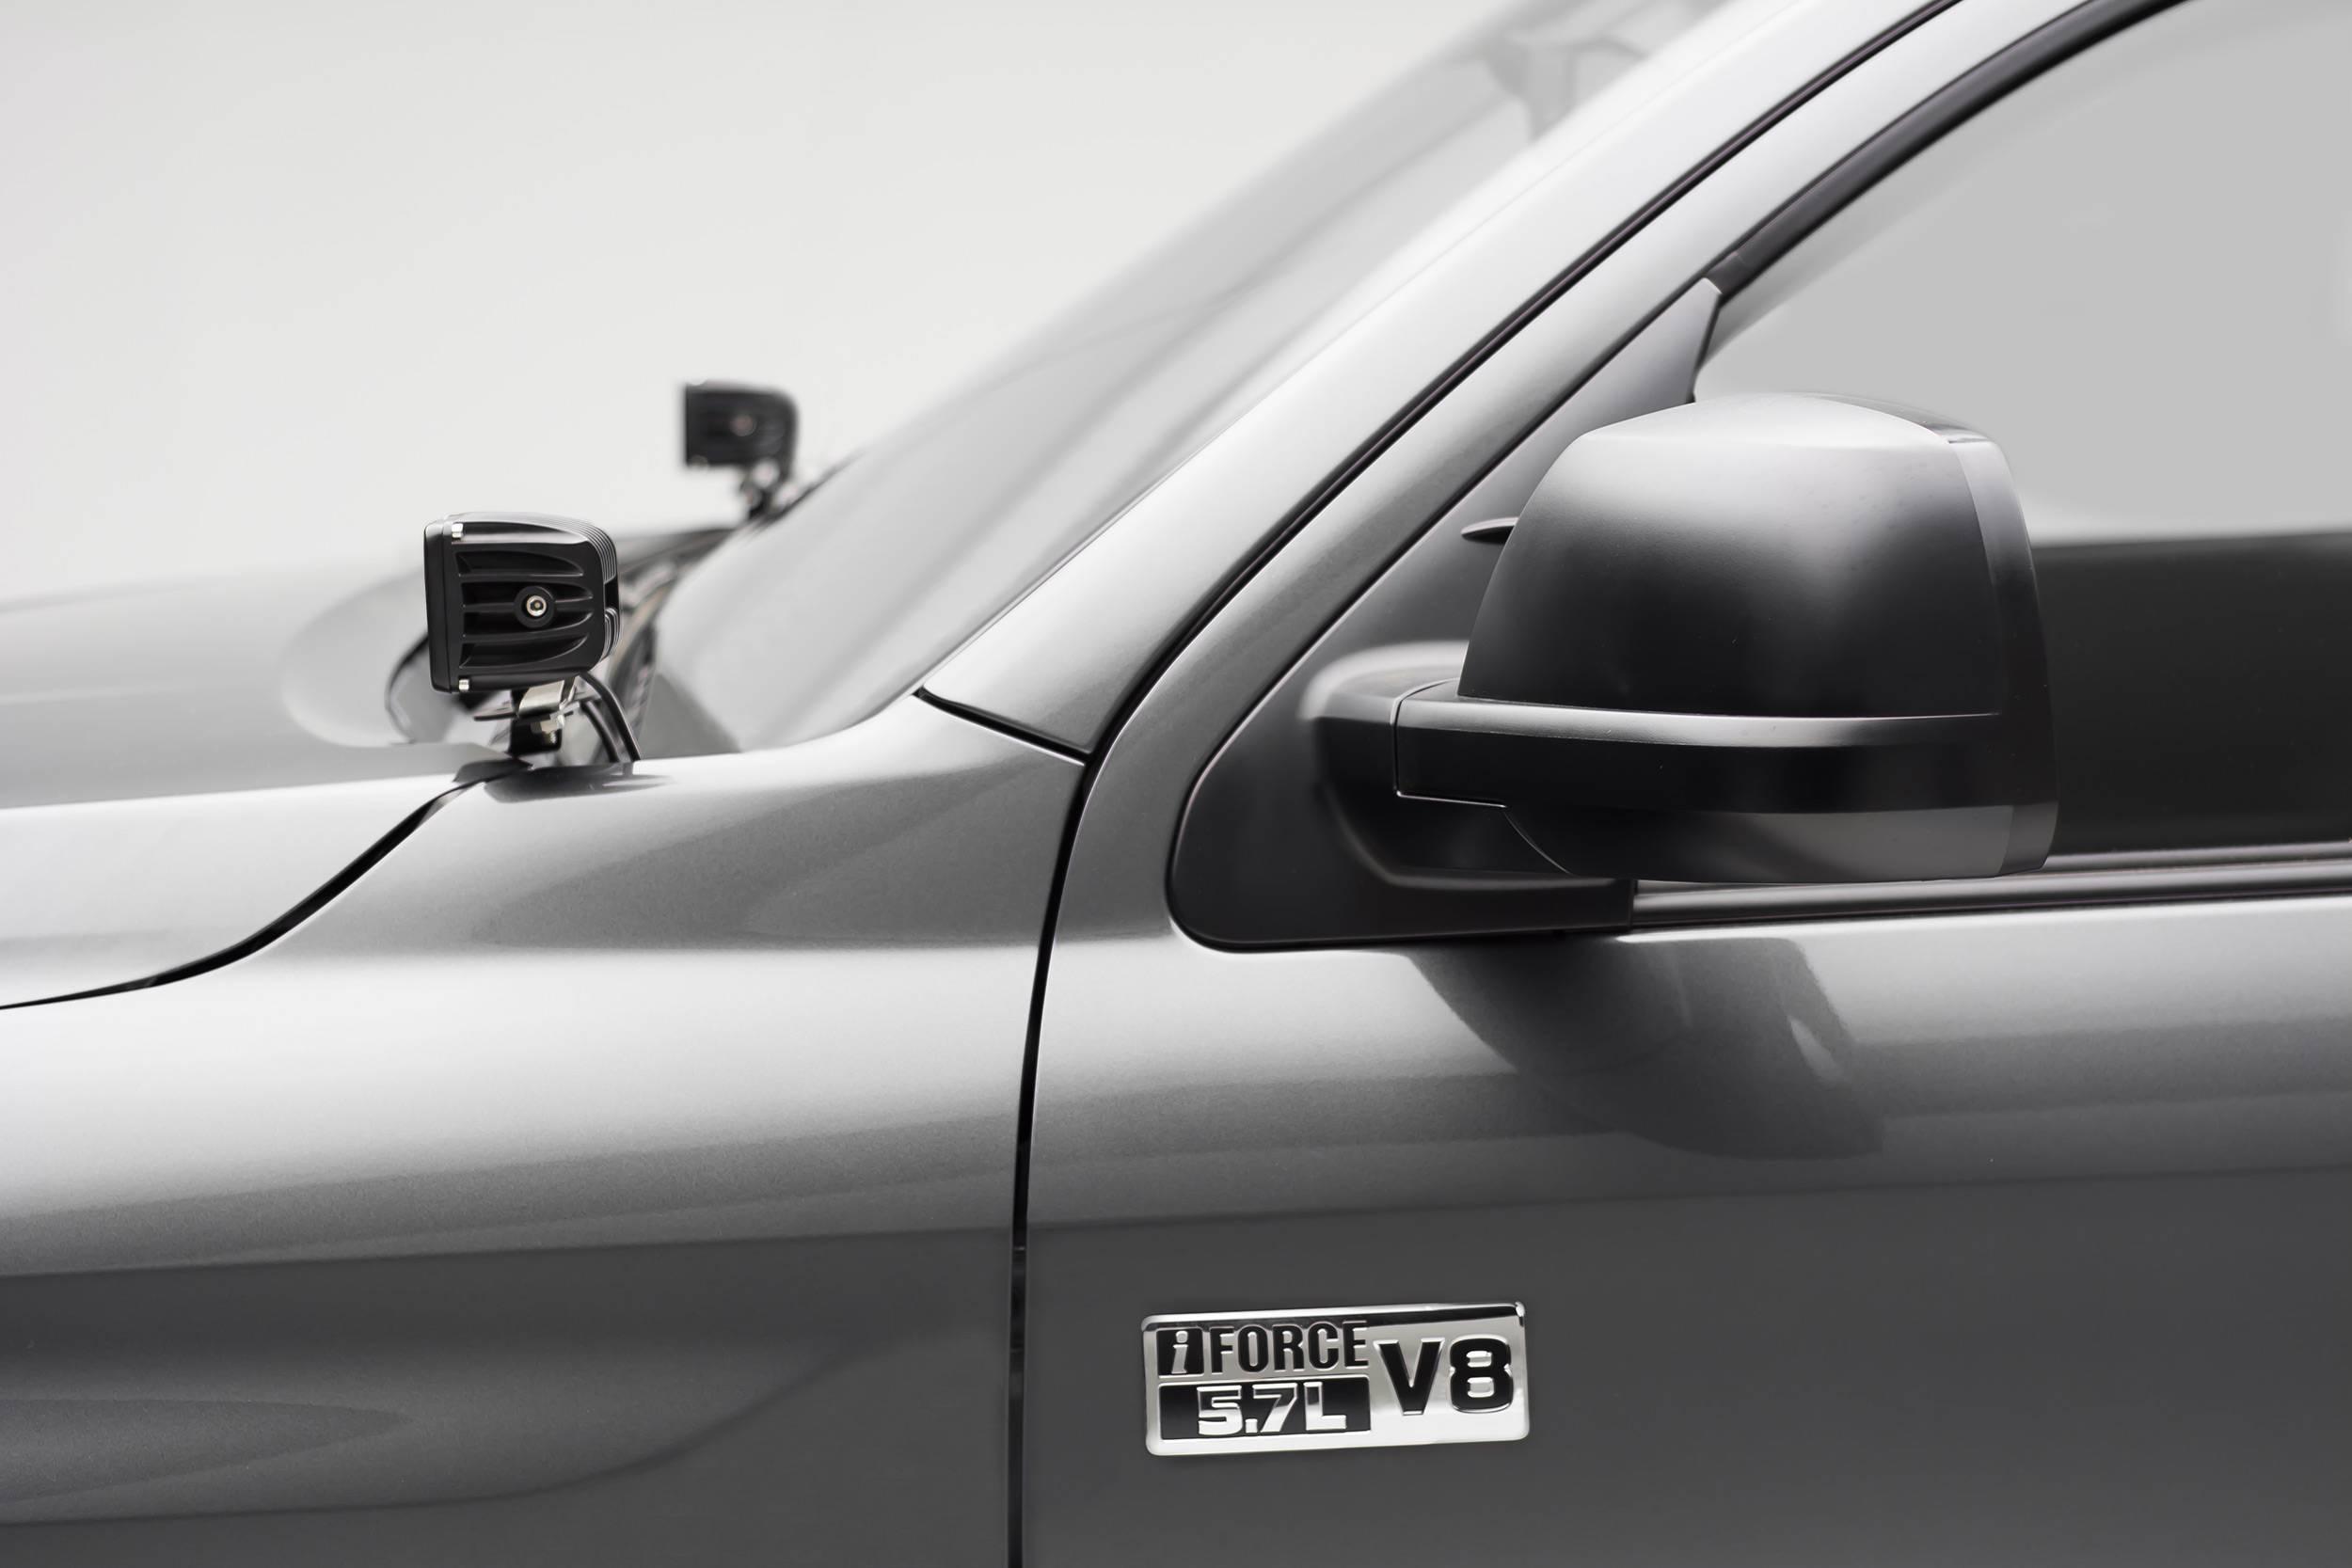 ZROADZ OFF ROAD PRODUCTS - 2014-2021 Toyota Tundra Hood Hinge LED Bracket to mount (2) 3 Inch LED Pod Lights - PN #Z369641